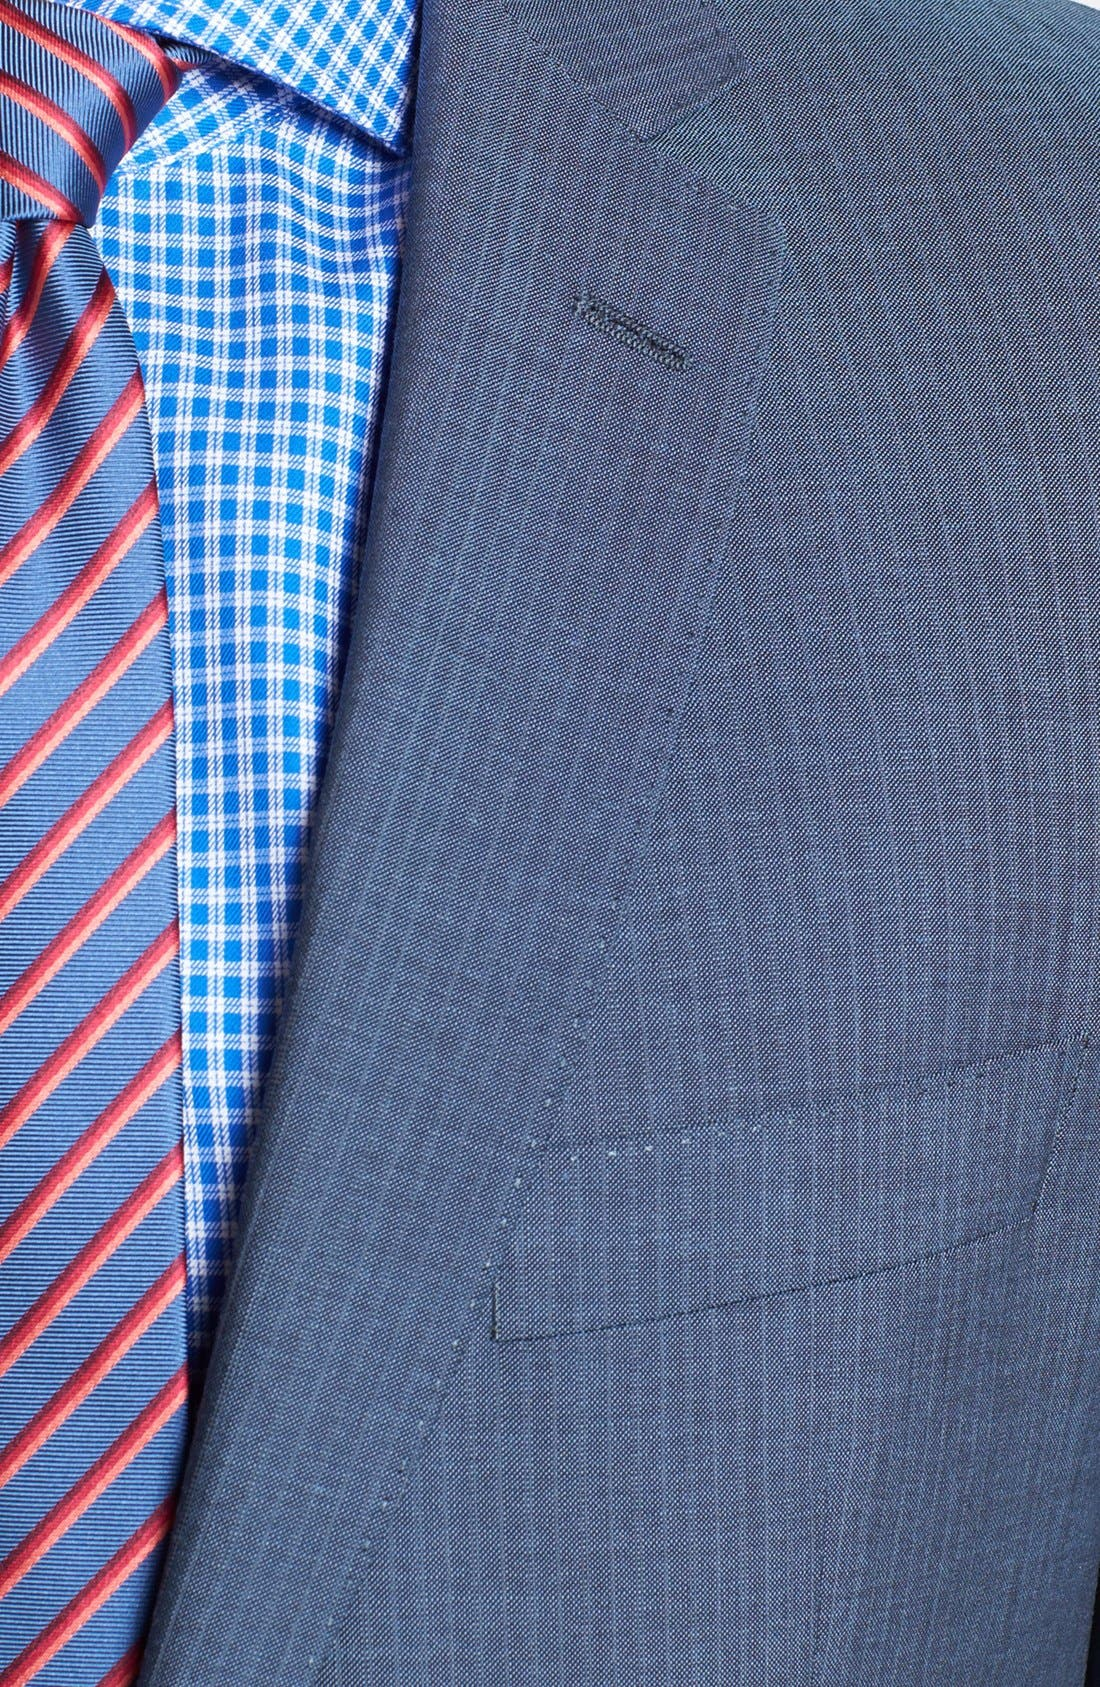 Alternate Image 2  - BOSS HUGO BOSS 'Edison/Power' Classic Fit Stripe Suit